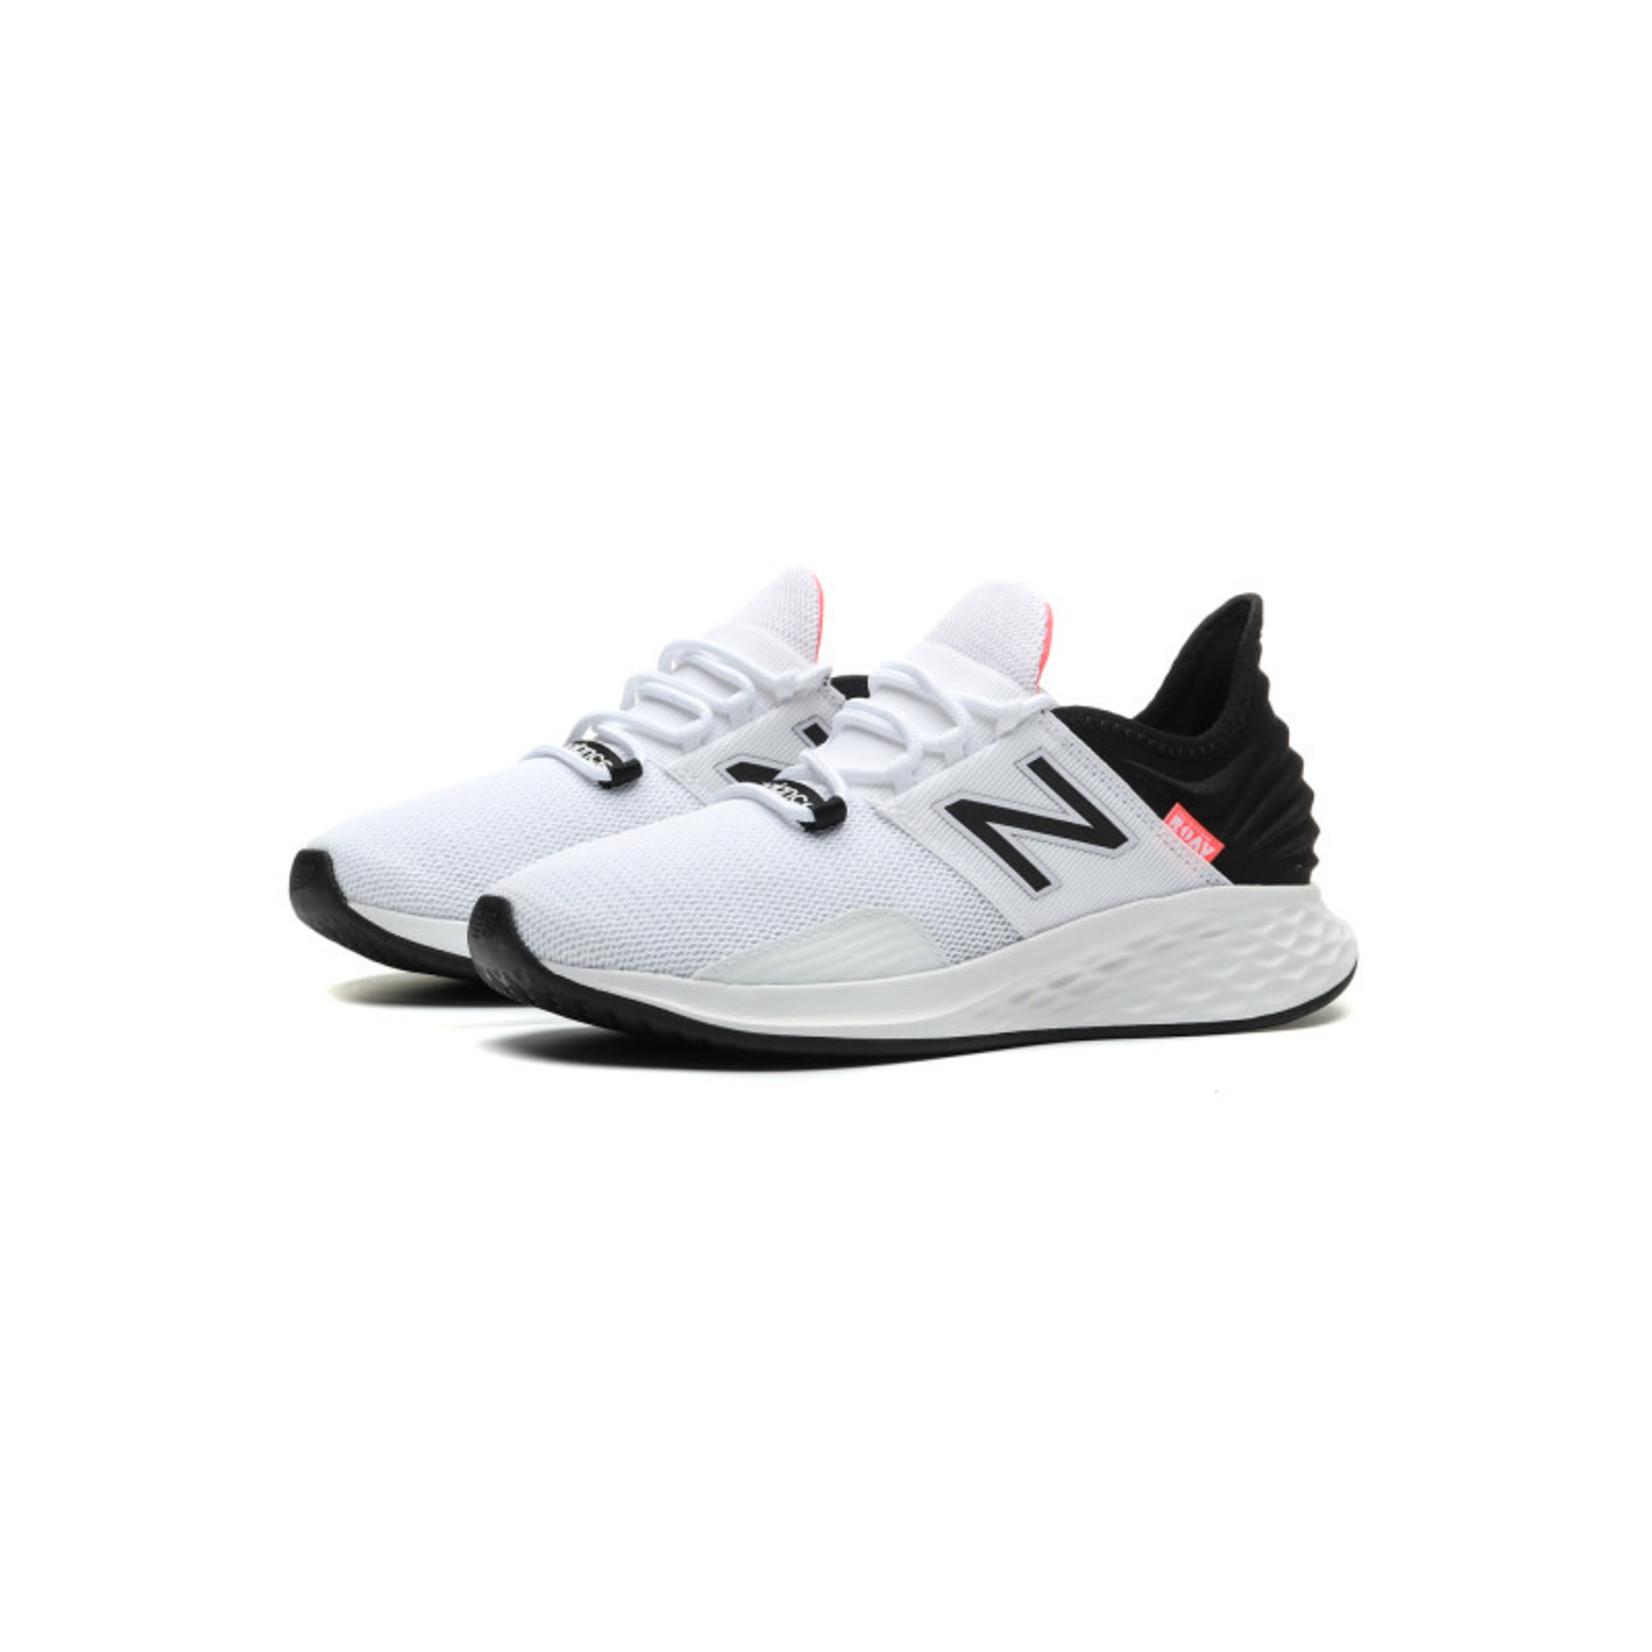 New Balance New Balance Running Shoes, WROAVLW, Ladies